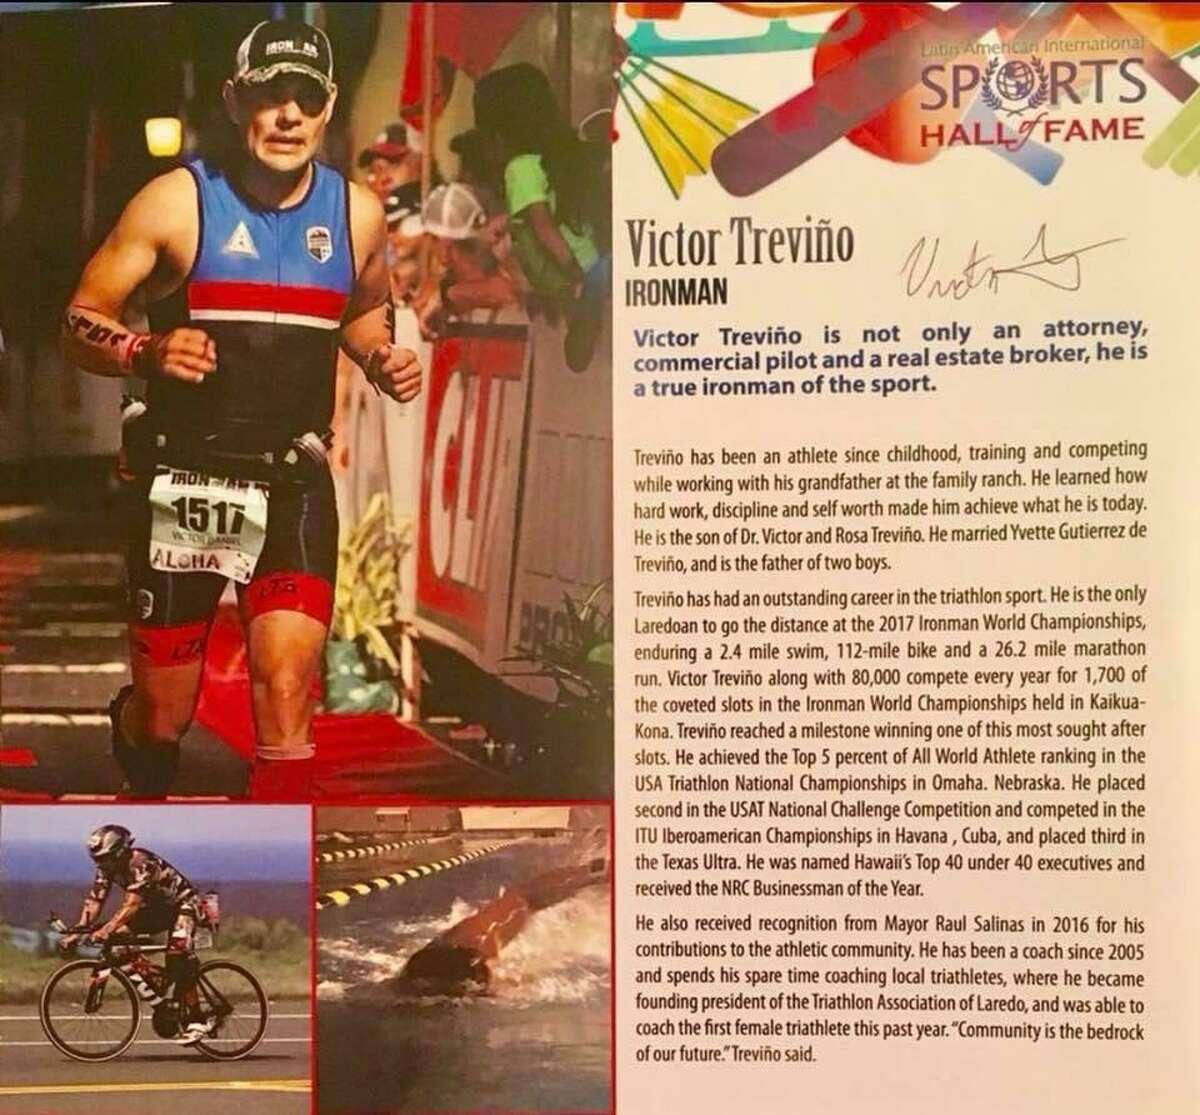 El triatleta laredense Víctor D. Treviño Jr., fue inducido al Latin American International Sports Hall of Fame en 2018.